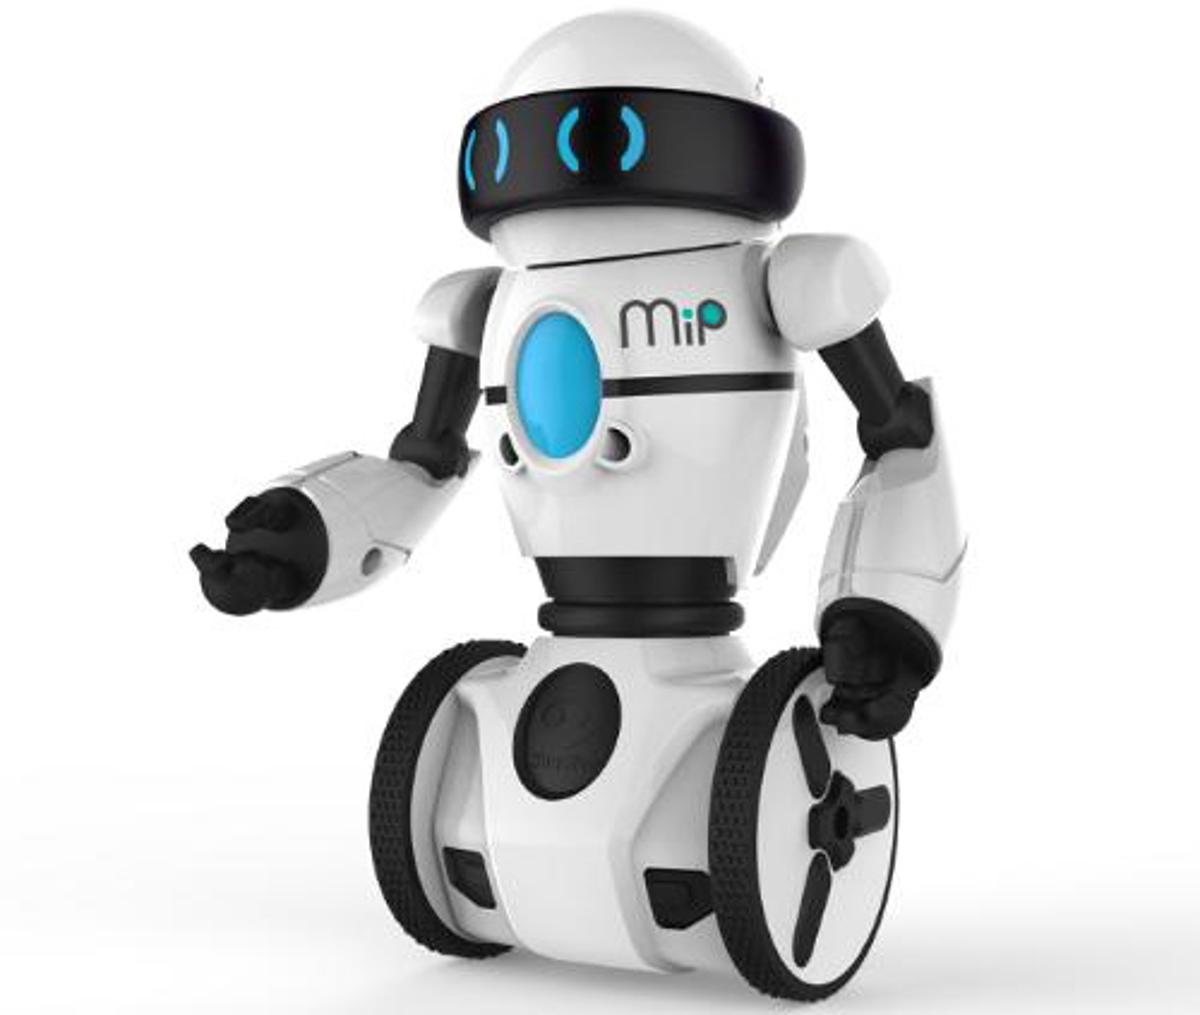 MiP balances on two wheels, using the mobile inverted pendulum principle